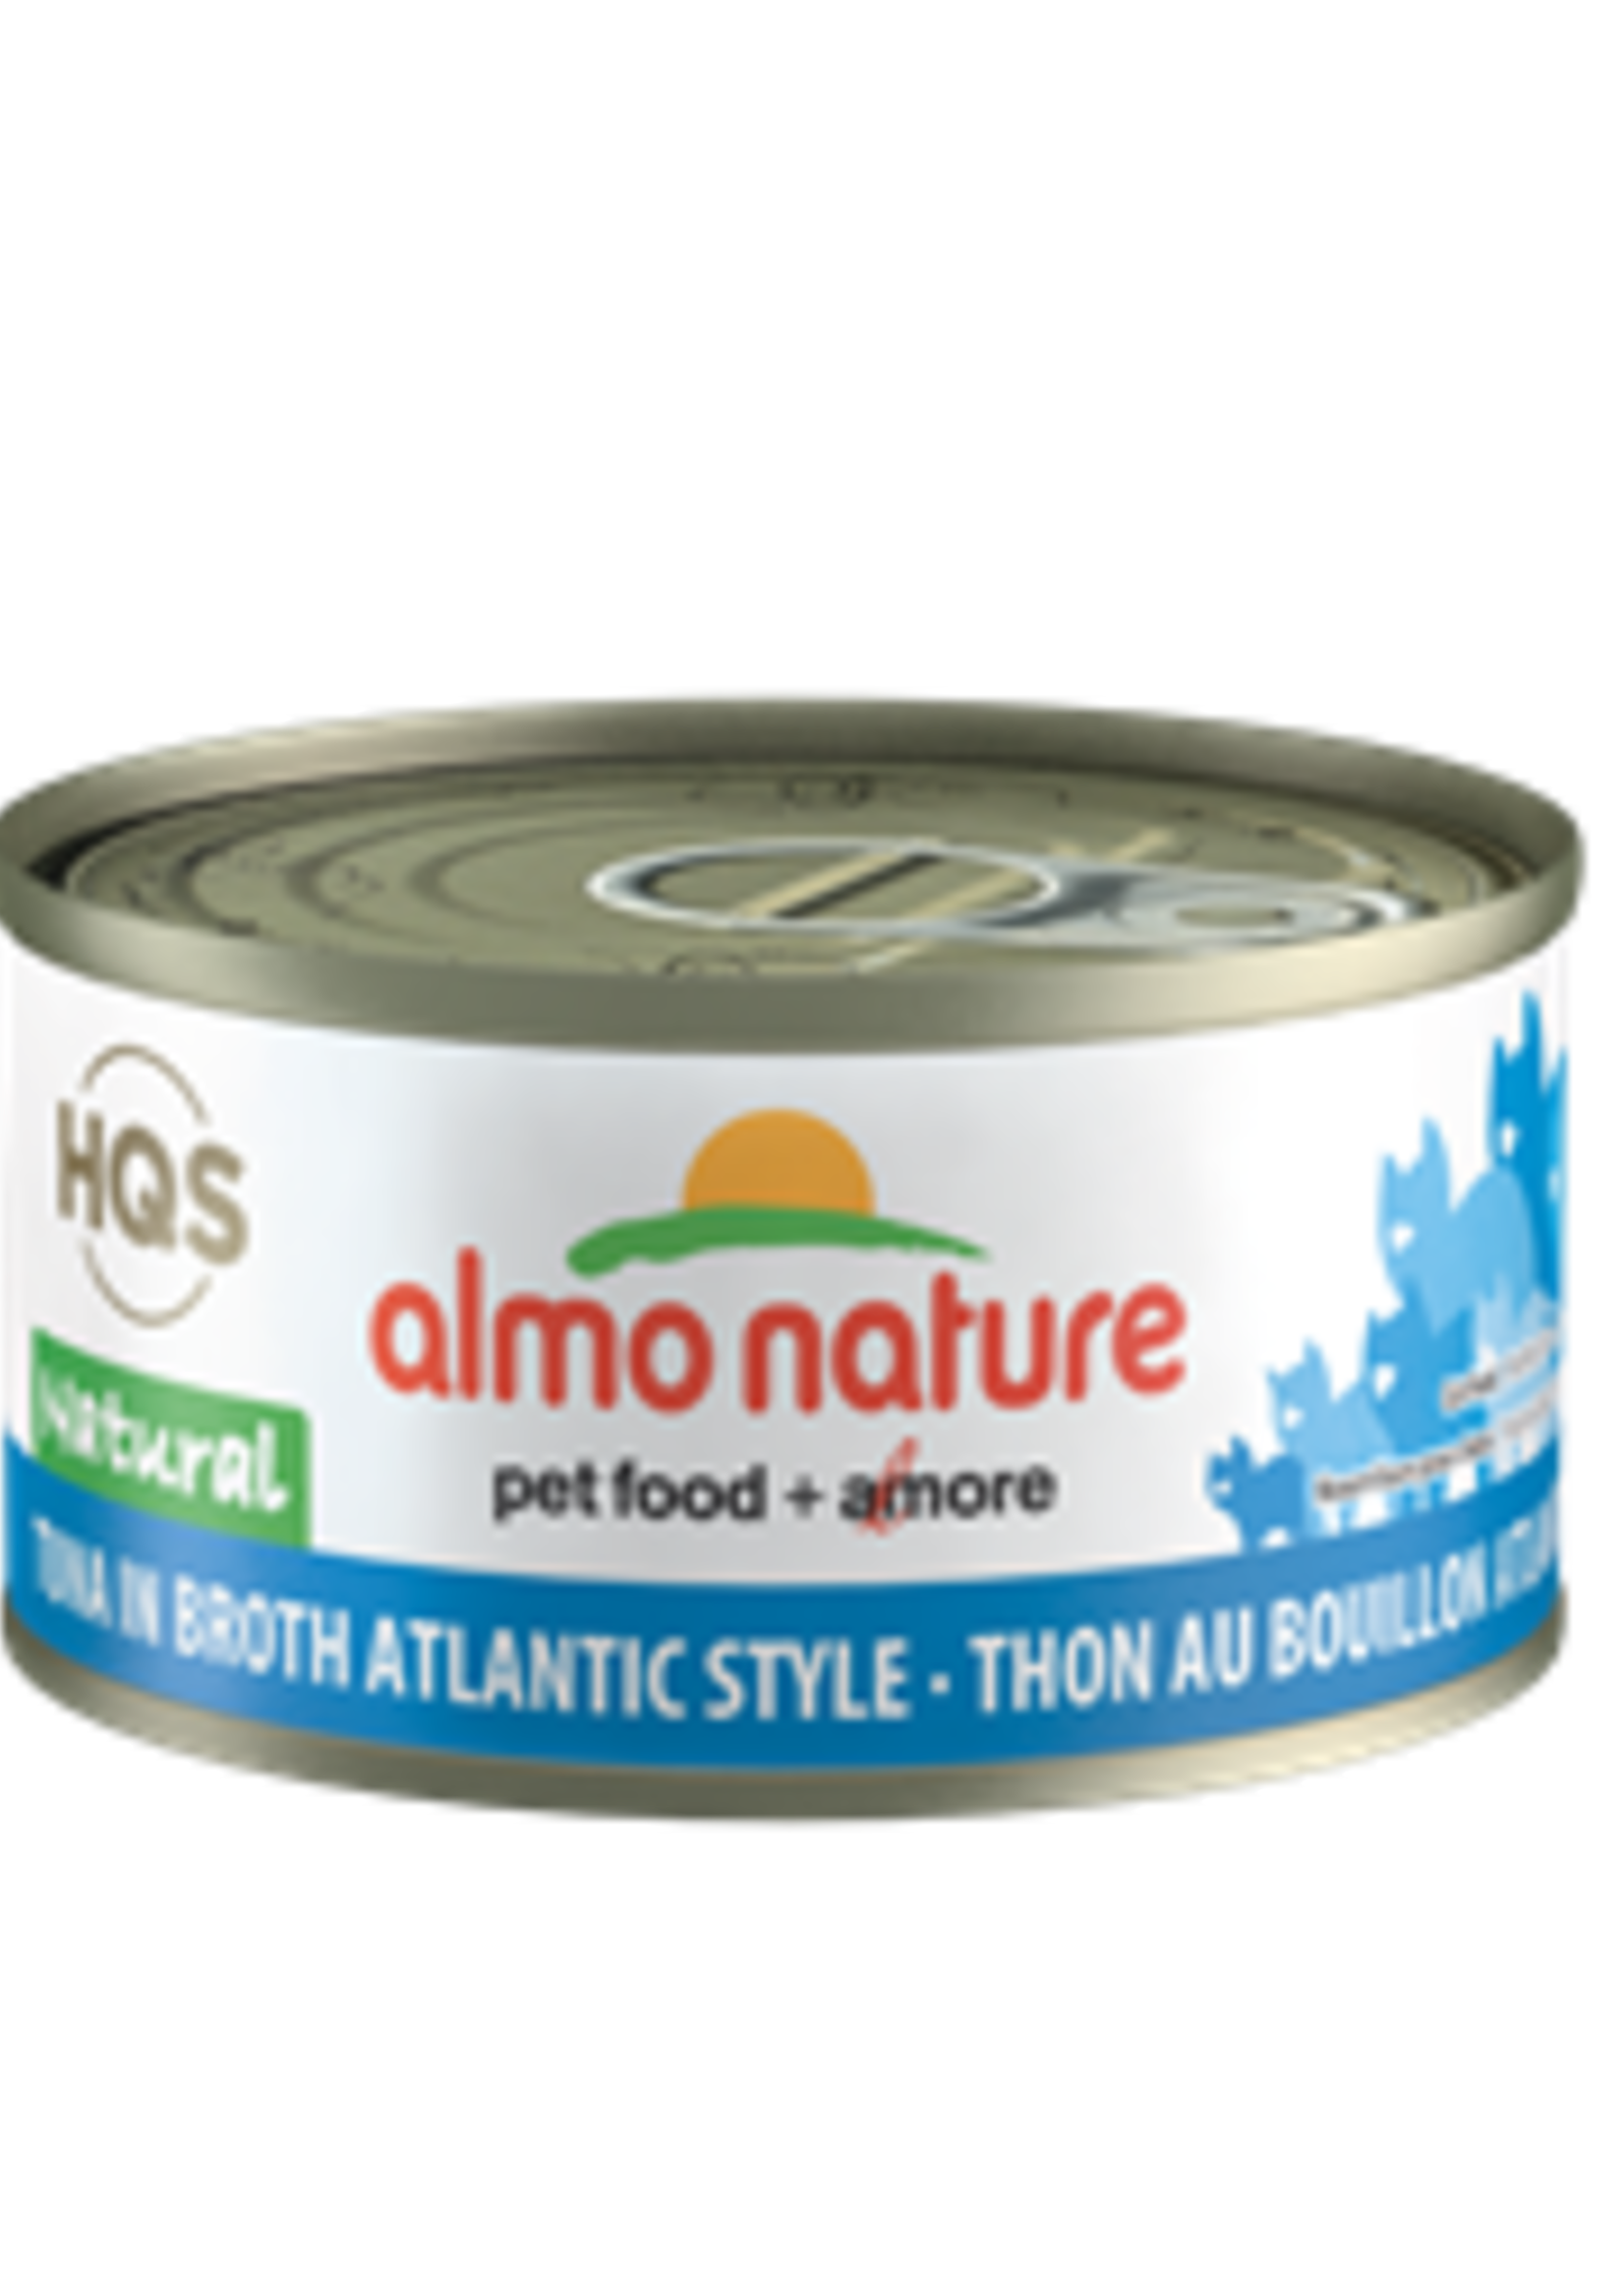 Almo Nature© Almo Nature HQS Natural Tuna in Broth Atlantic Style 70g